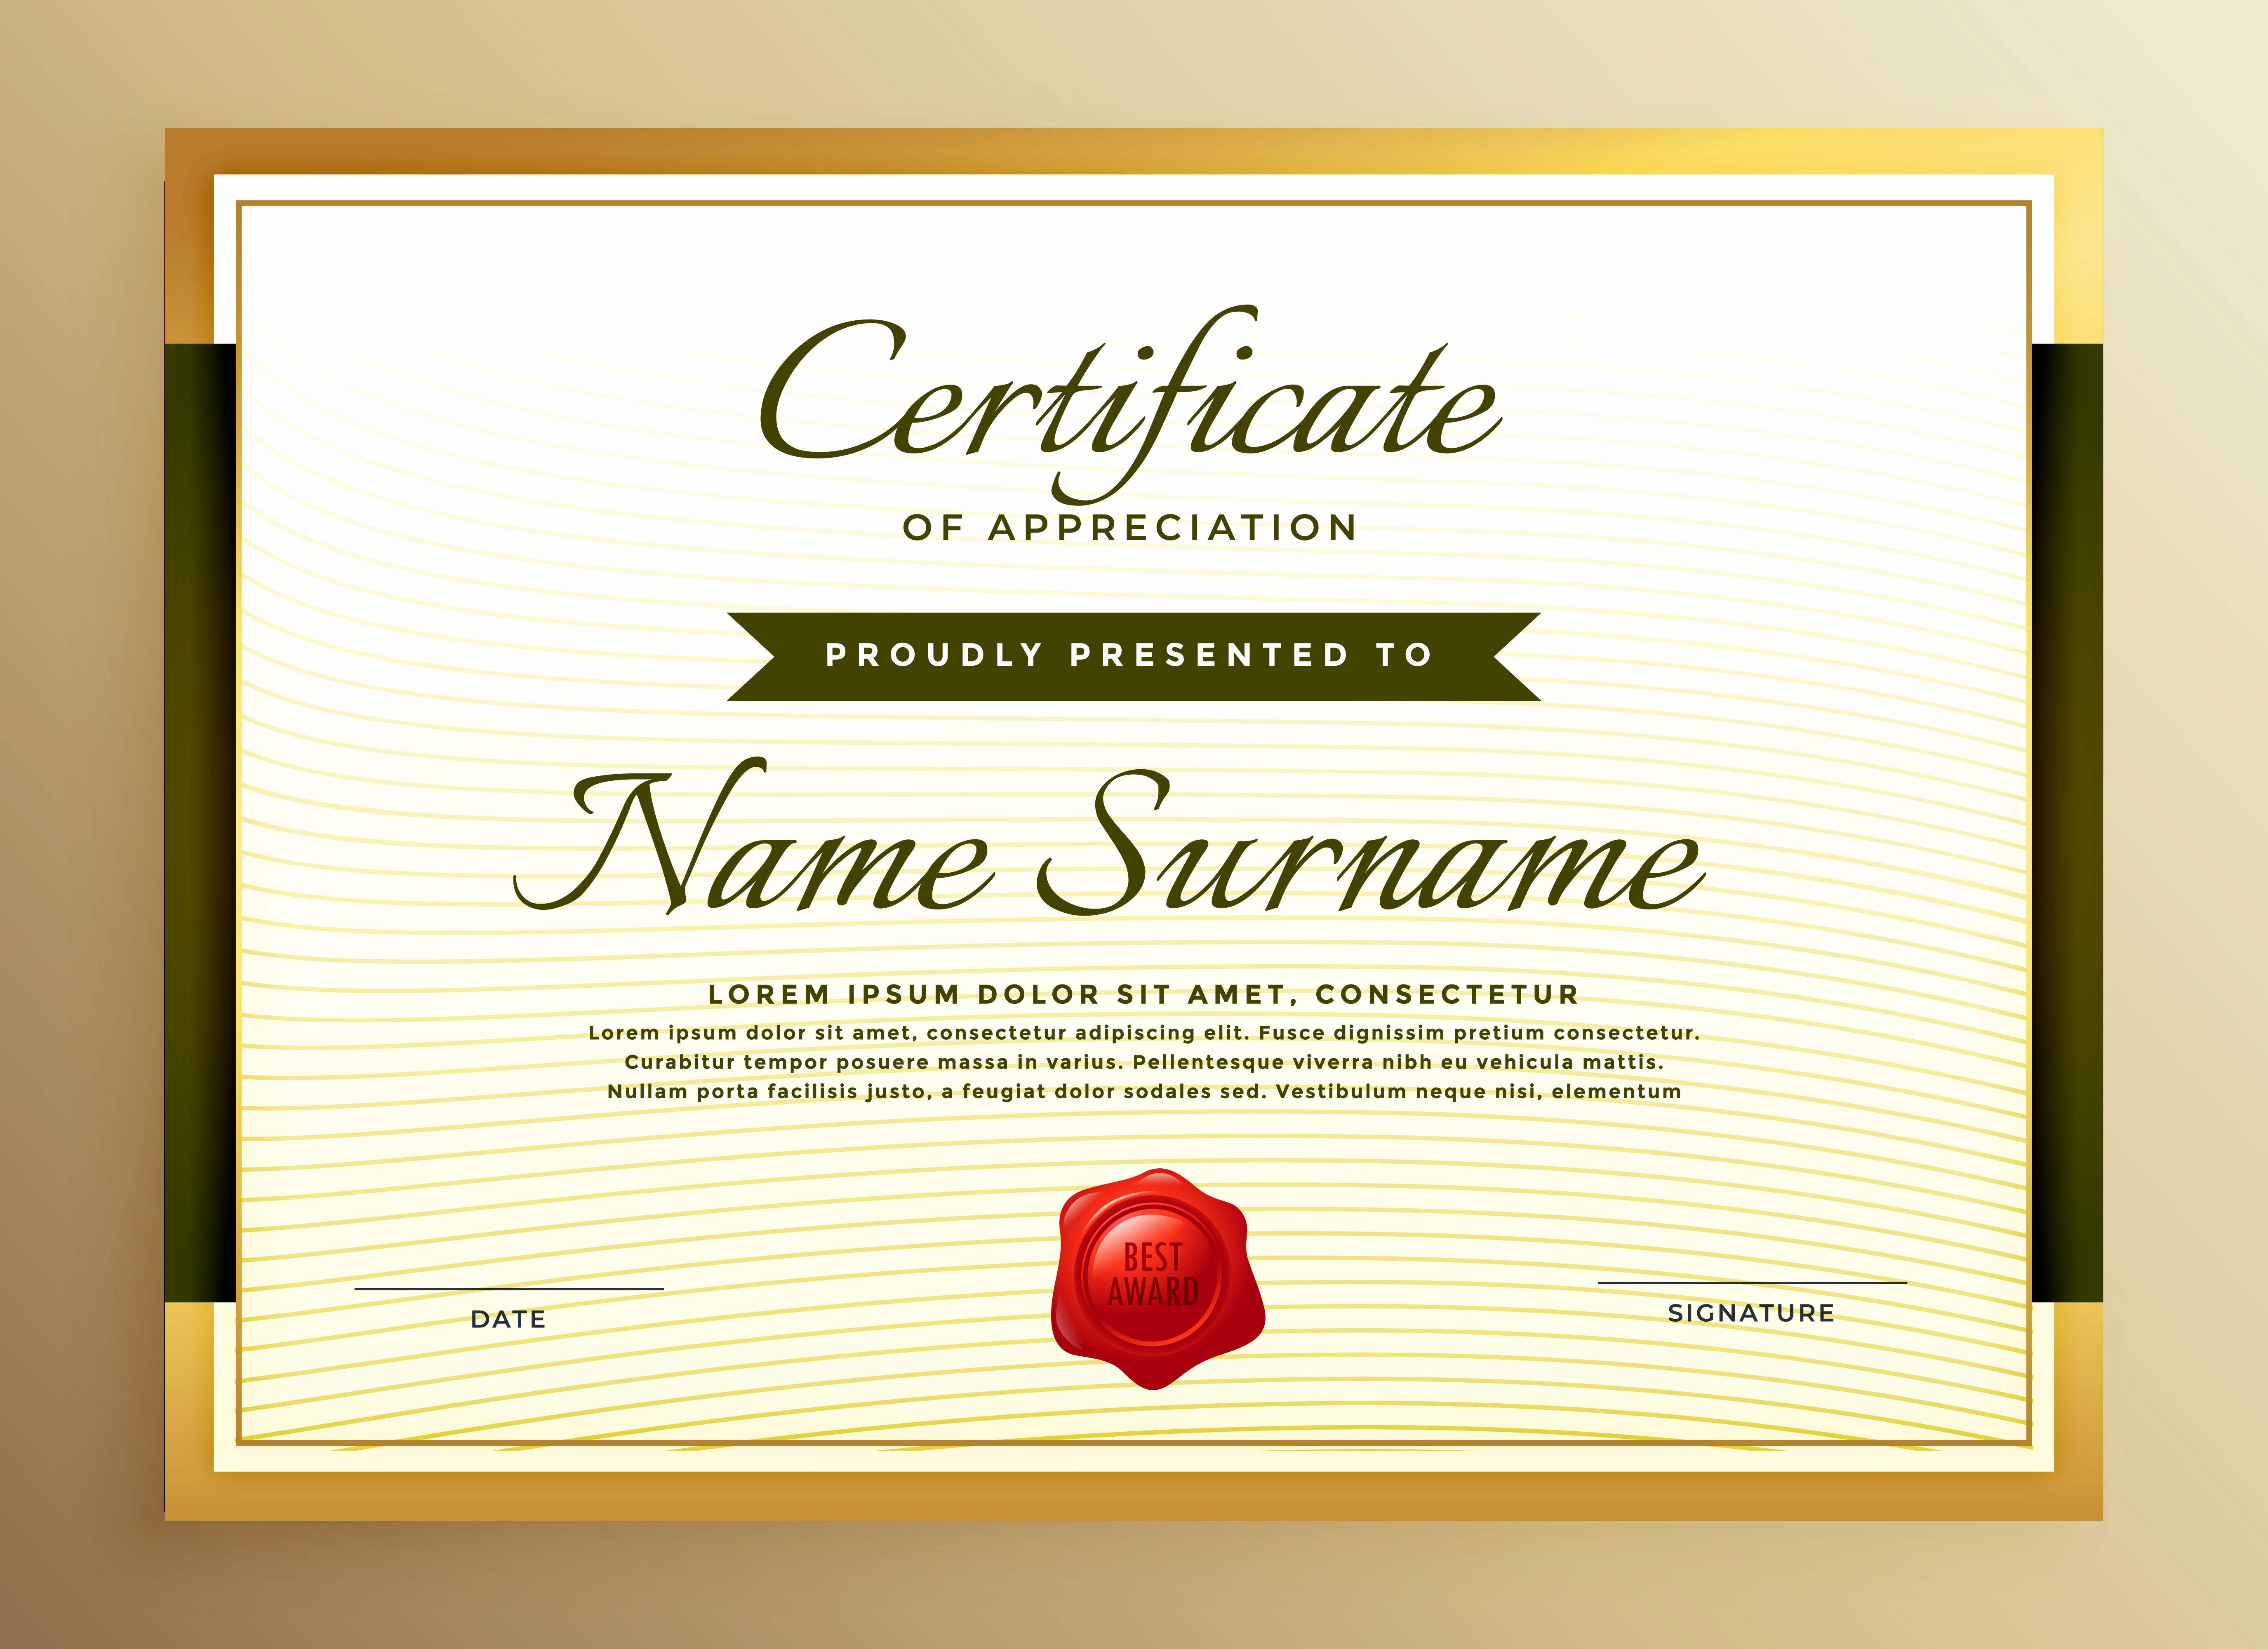 Template for Certificate Of Appreciation Awesome Premium Golden Certificate Of Appreciation Template